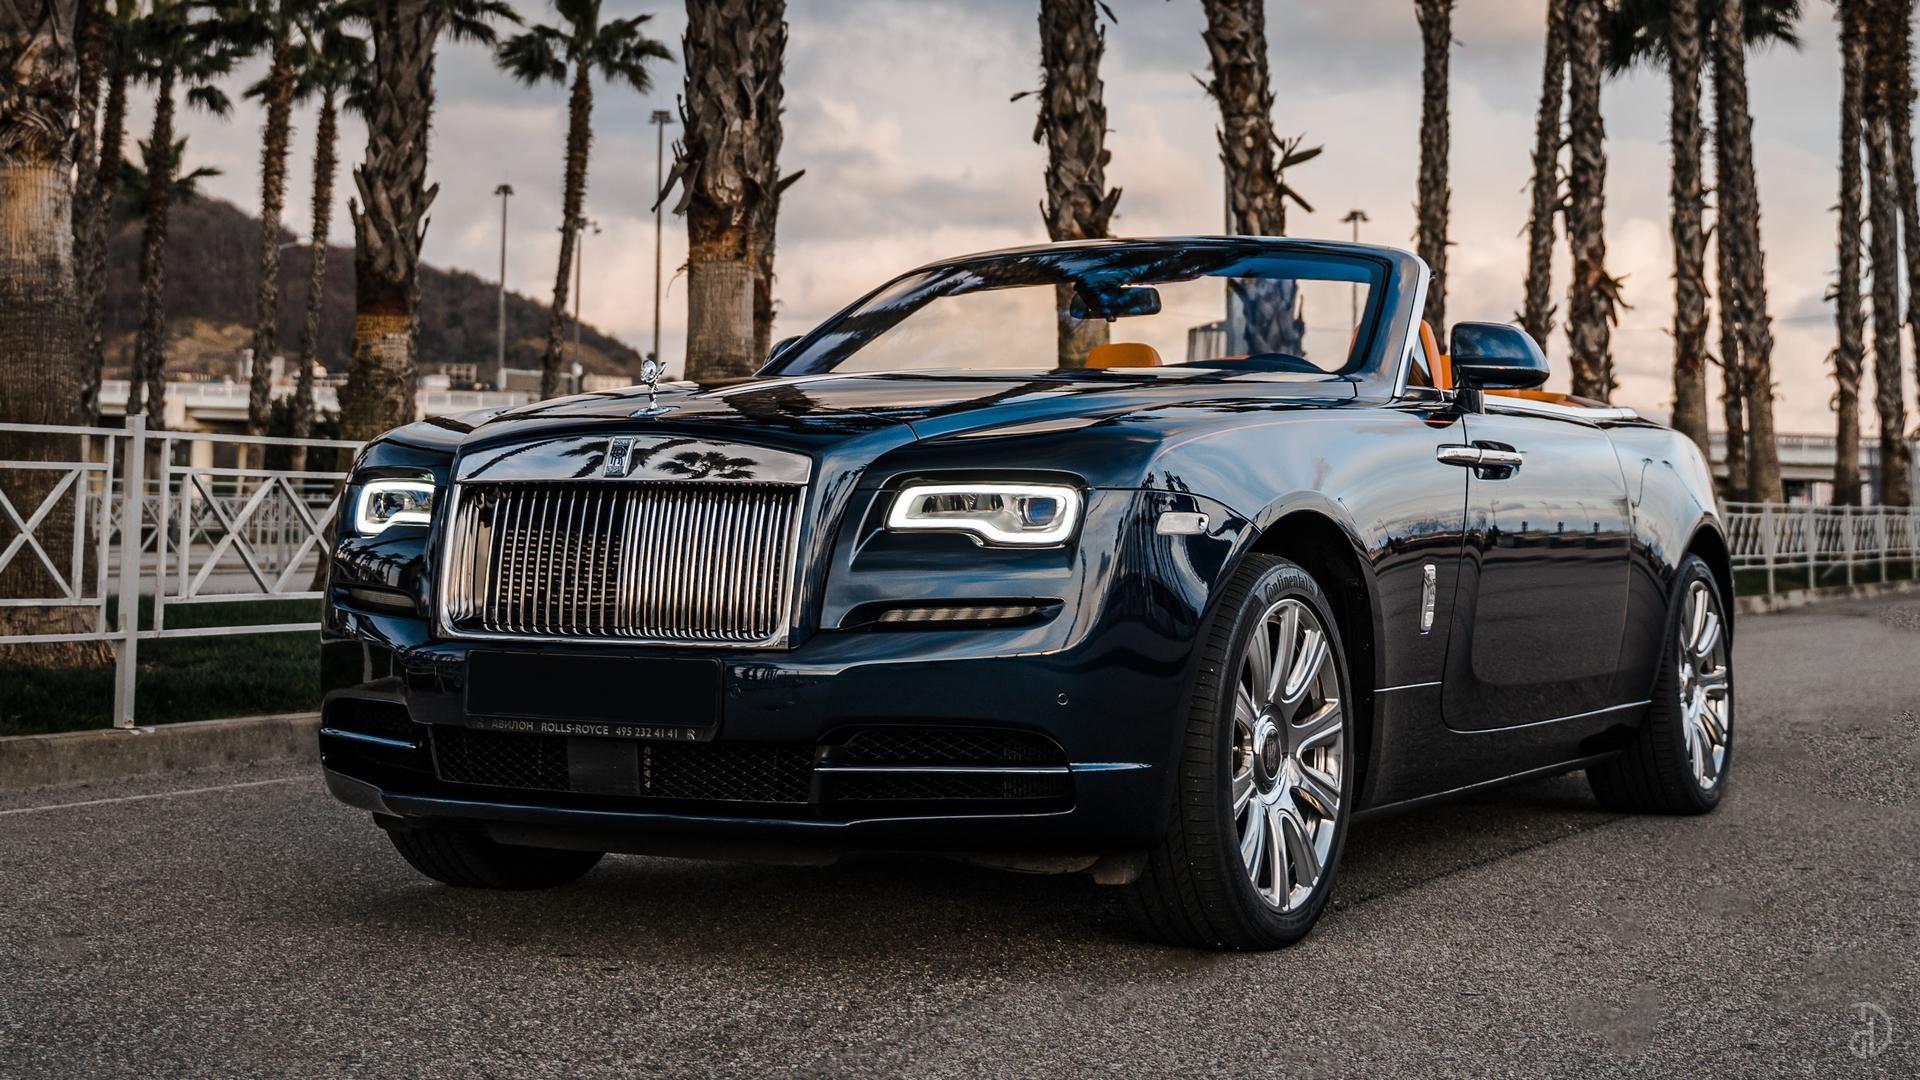 Аренда Rolls-Royce Dawn в Сочи. Фото 11